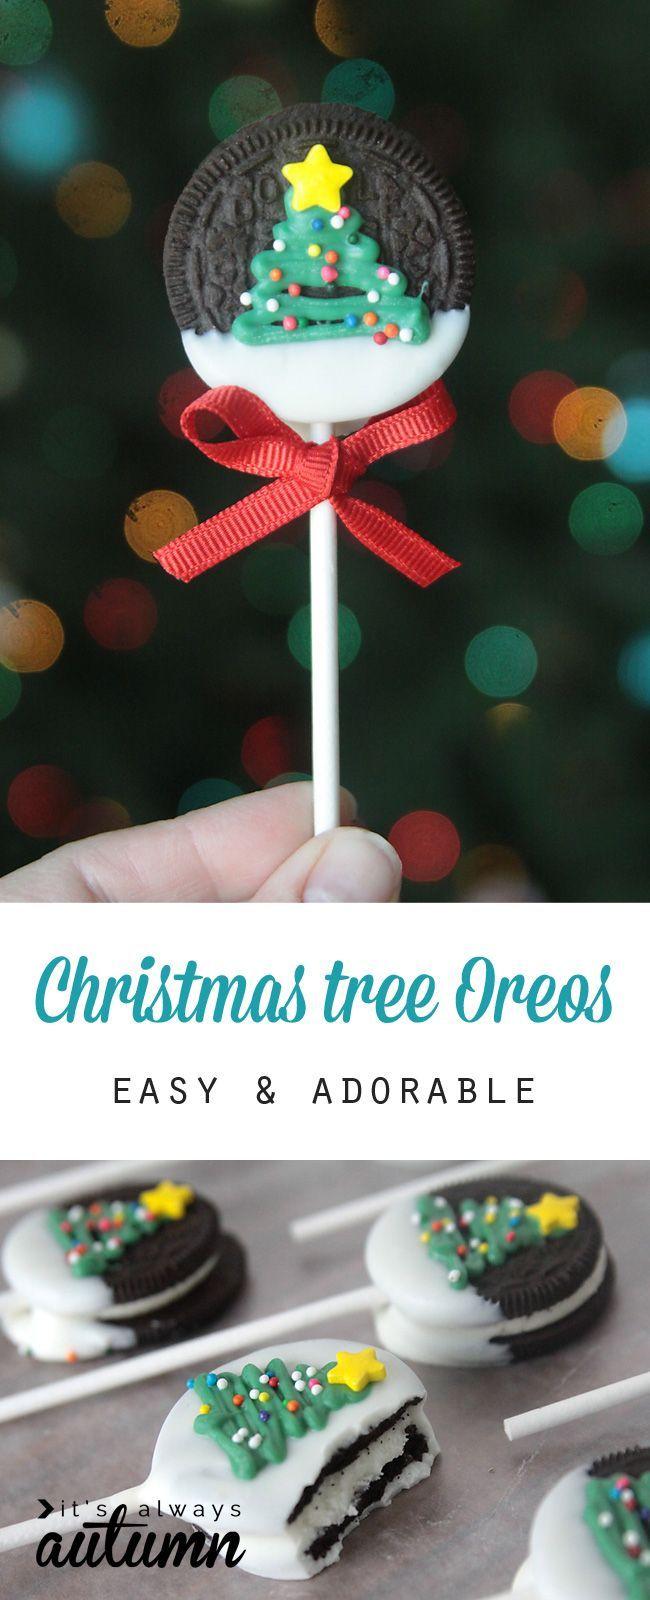 Holiday Dessert Gift Ideas - Eskayalitim